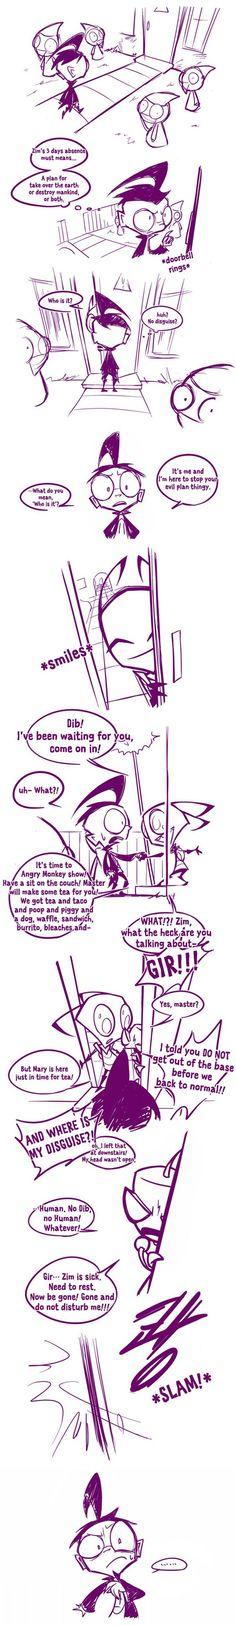 Zim-Gir Comics thingy by Naplez.deviantart.com on @deviantART: